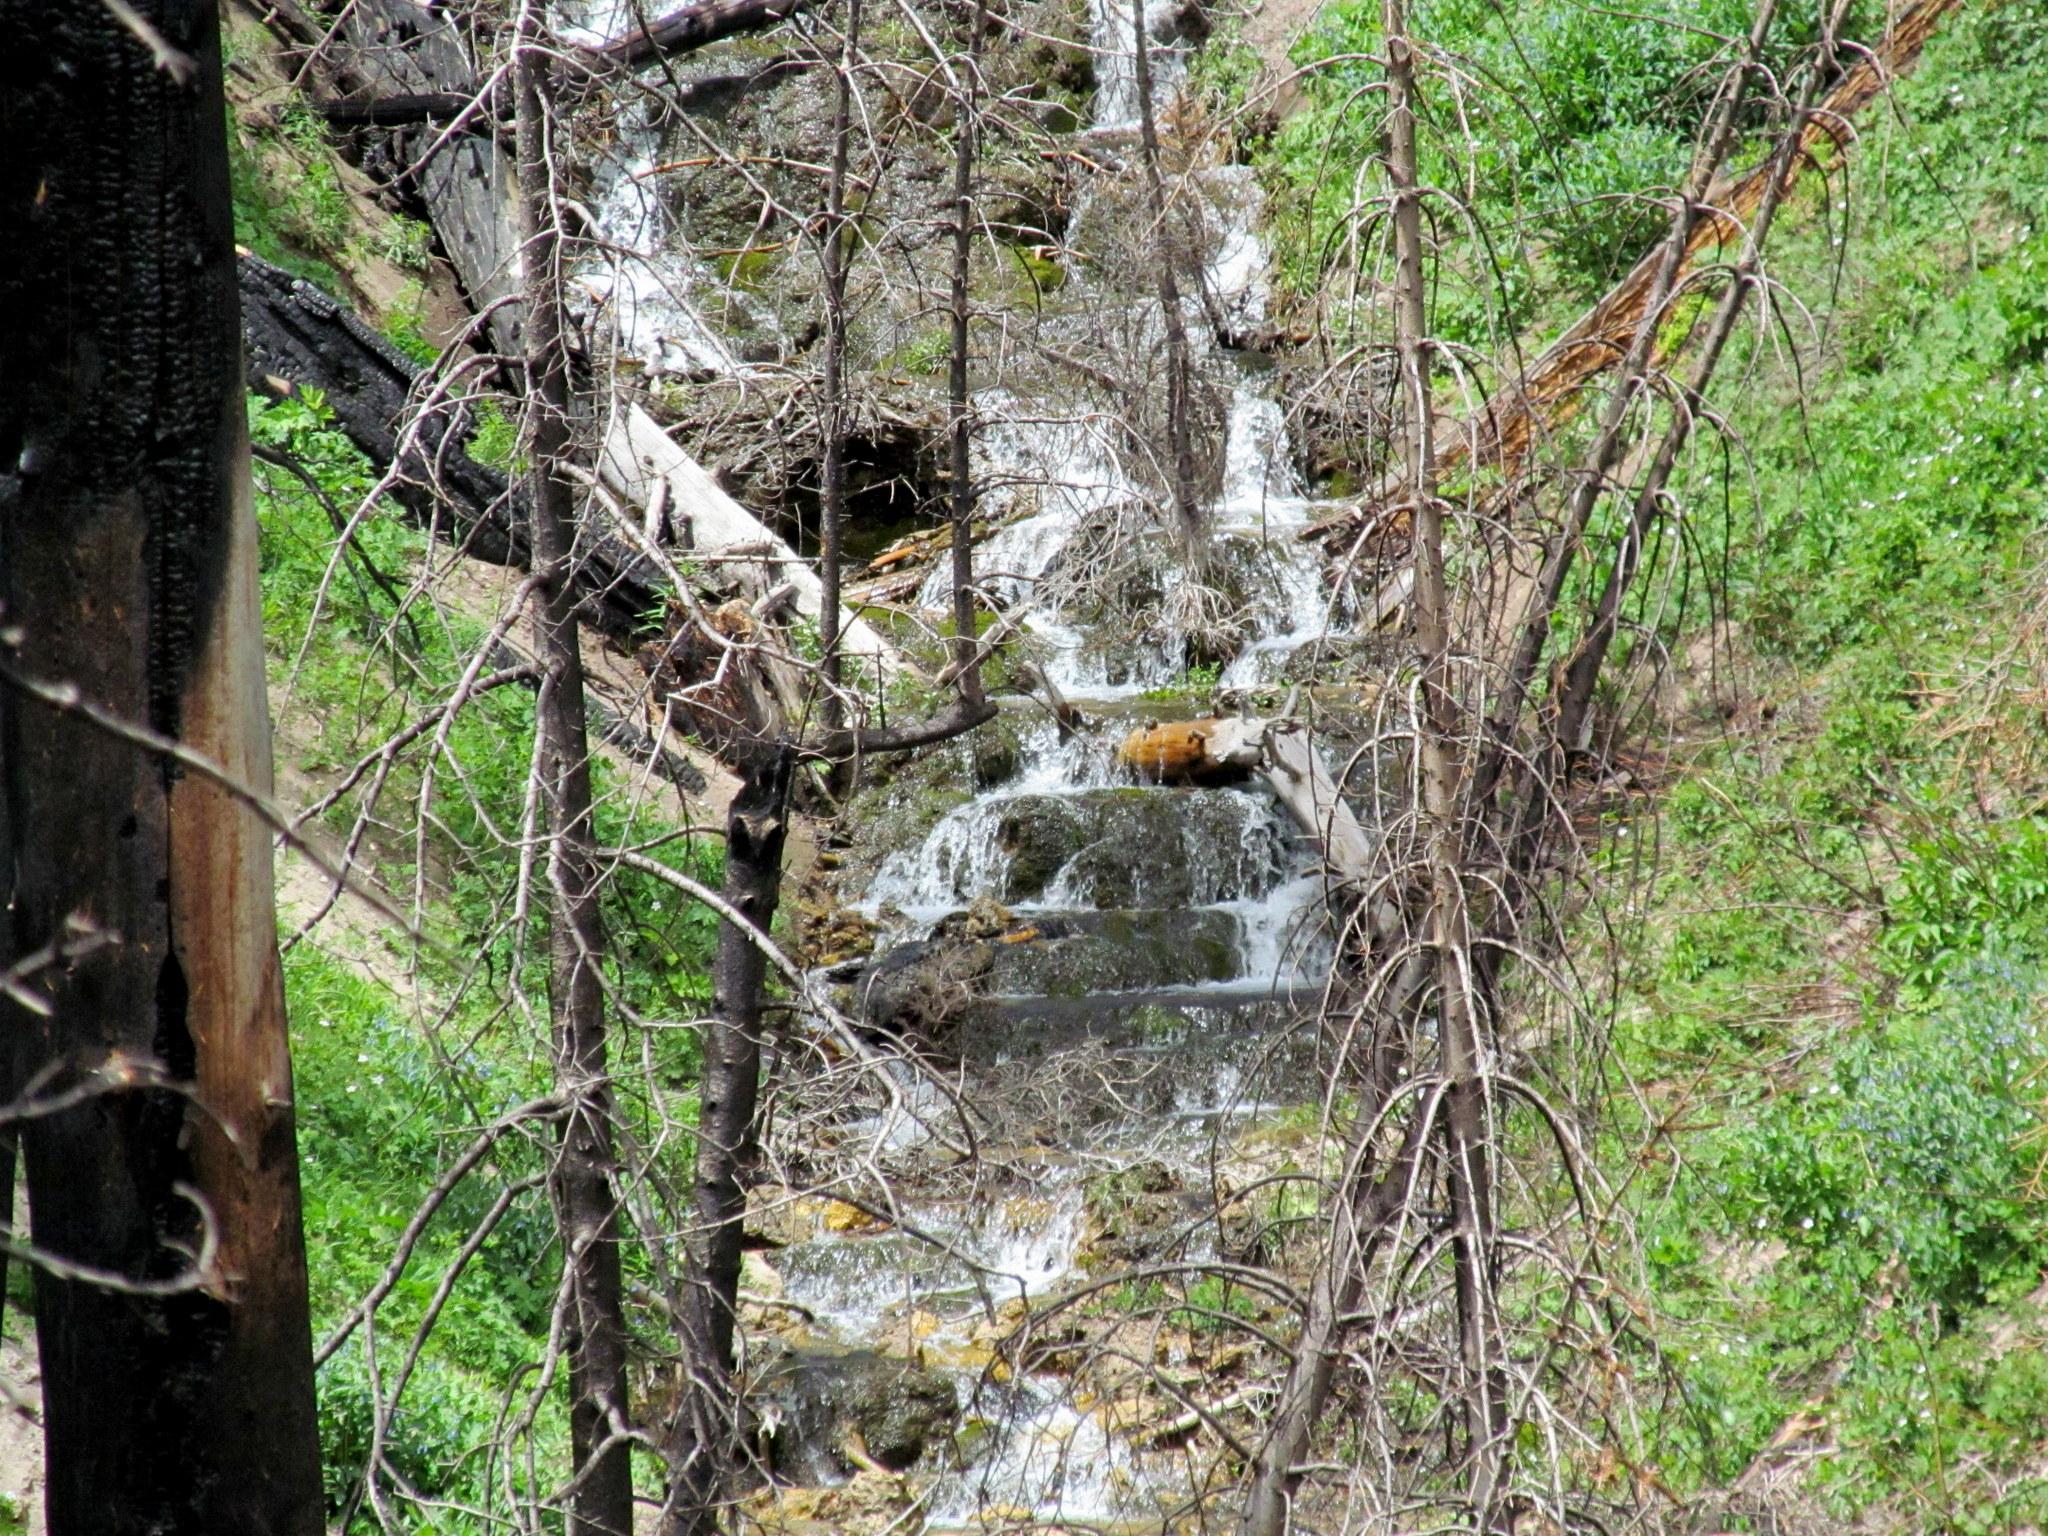 Photo: Falls above the sawmill